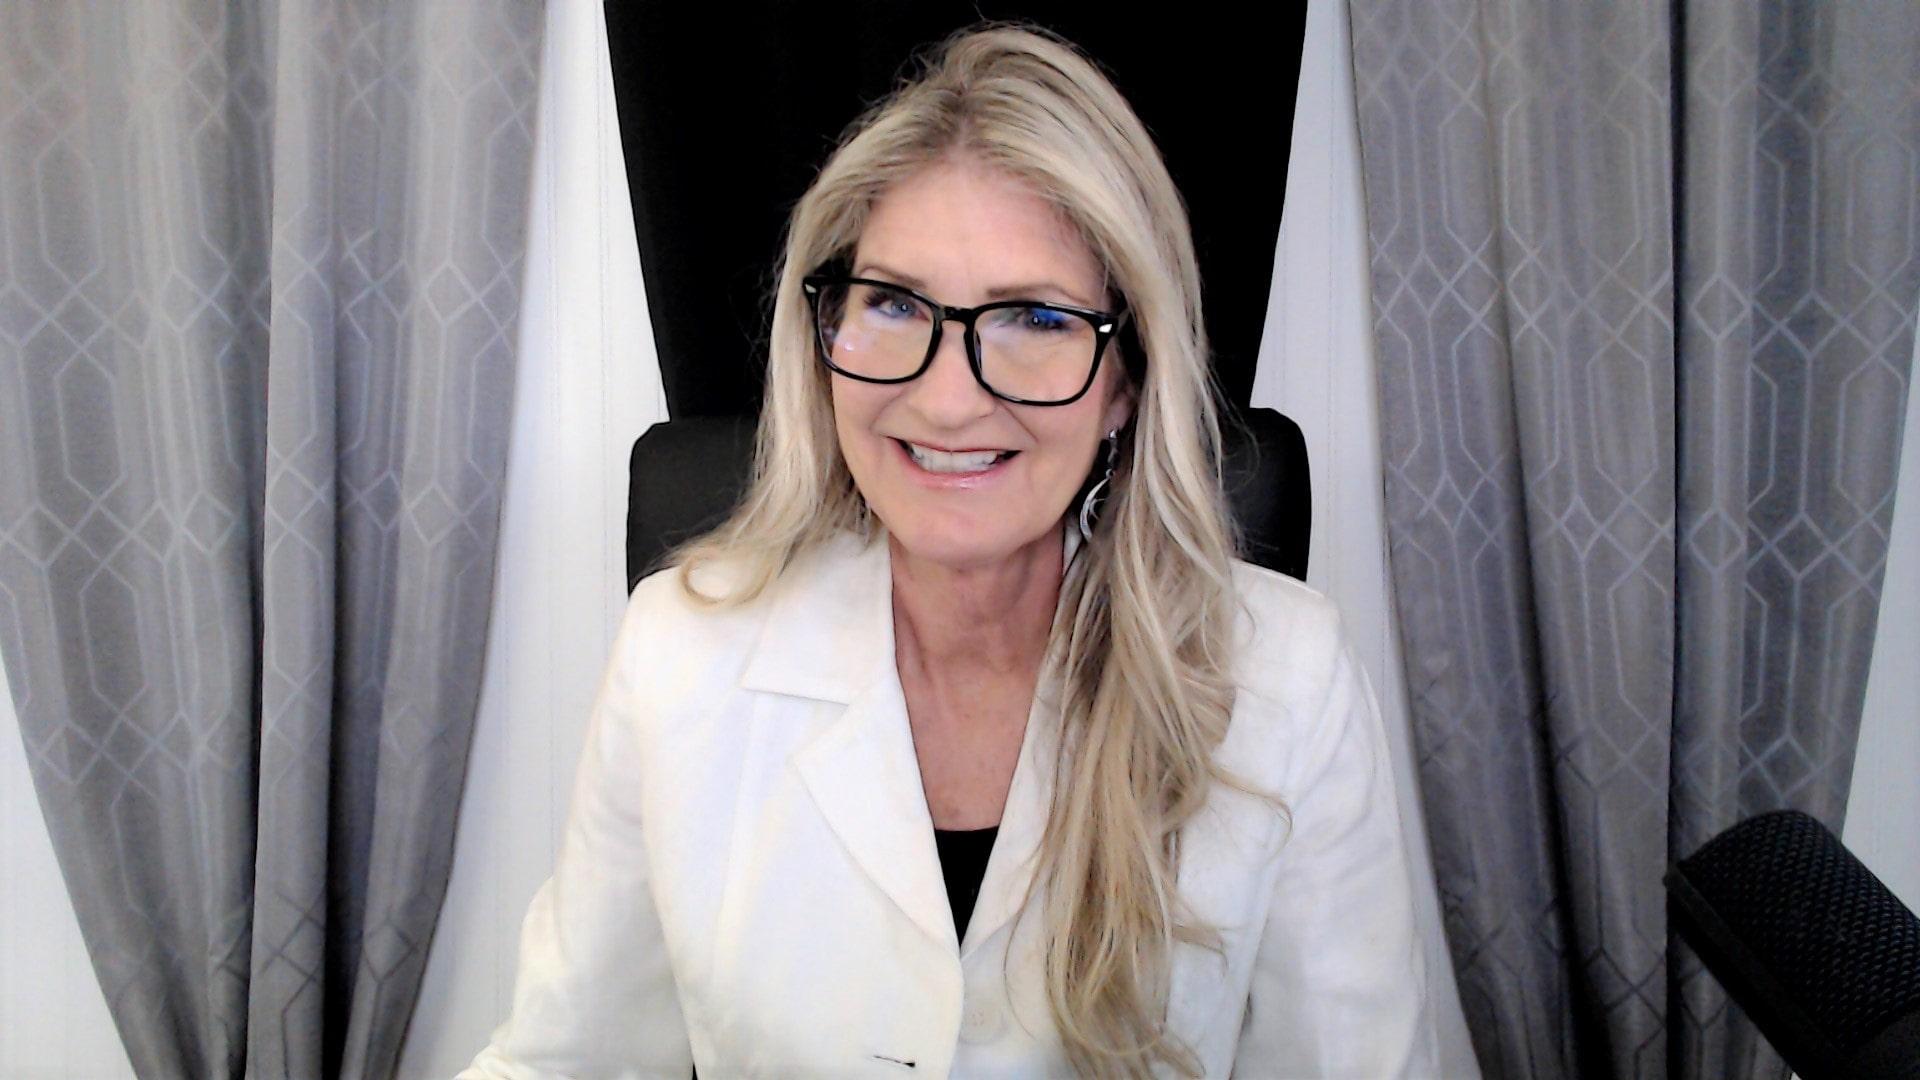 Melissa Holy sitting at desk smiling